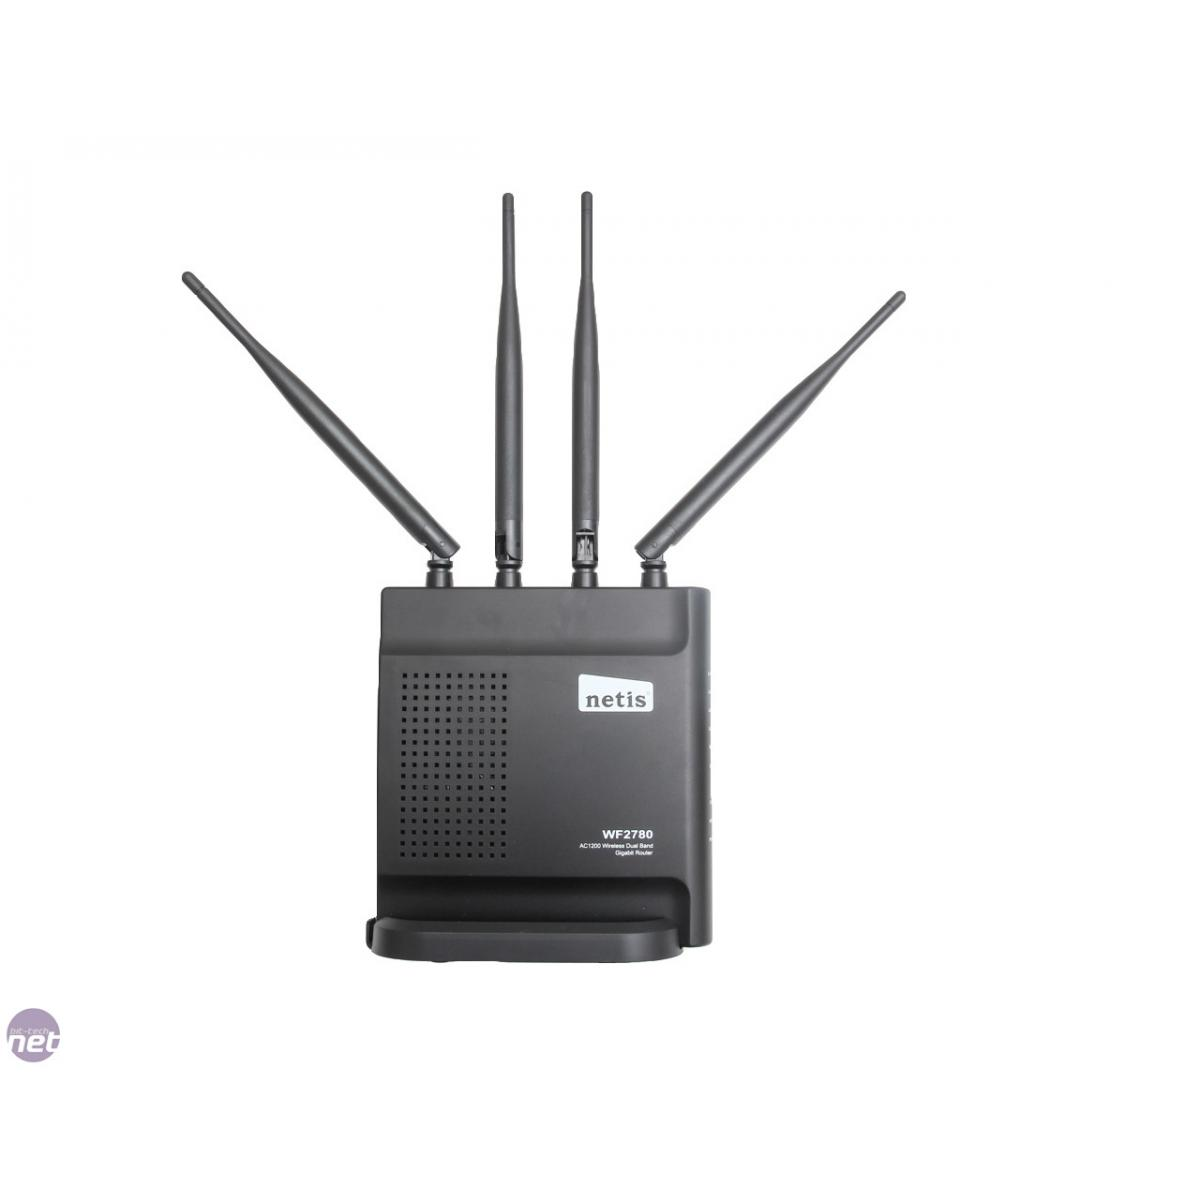 Netis Ac1200 Wireless Dual Band Gigabit Router Wf2780 Smart Wf2409e 300mbps 3 Antena 5dbi